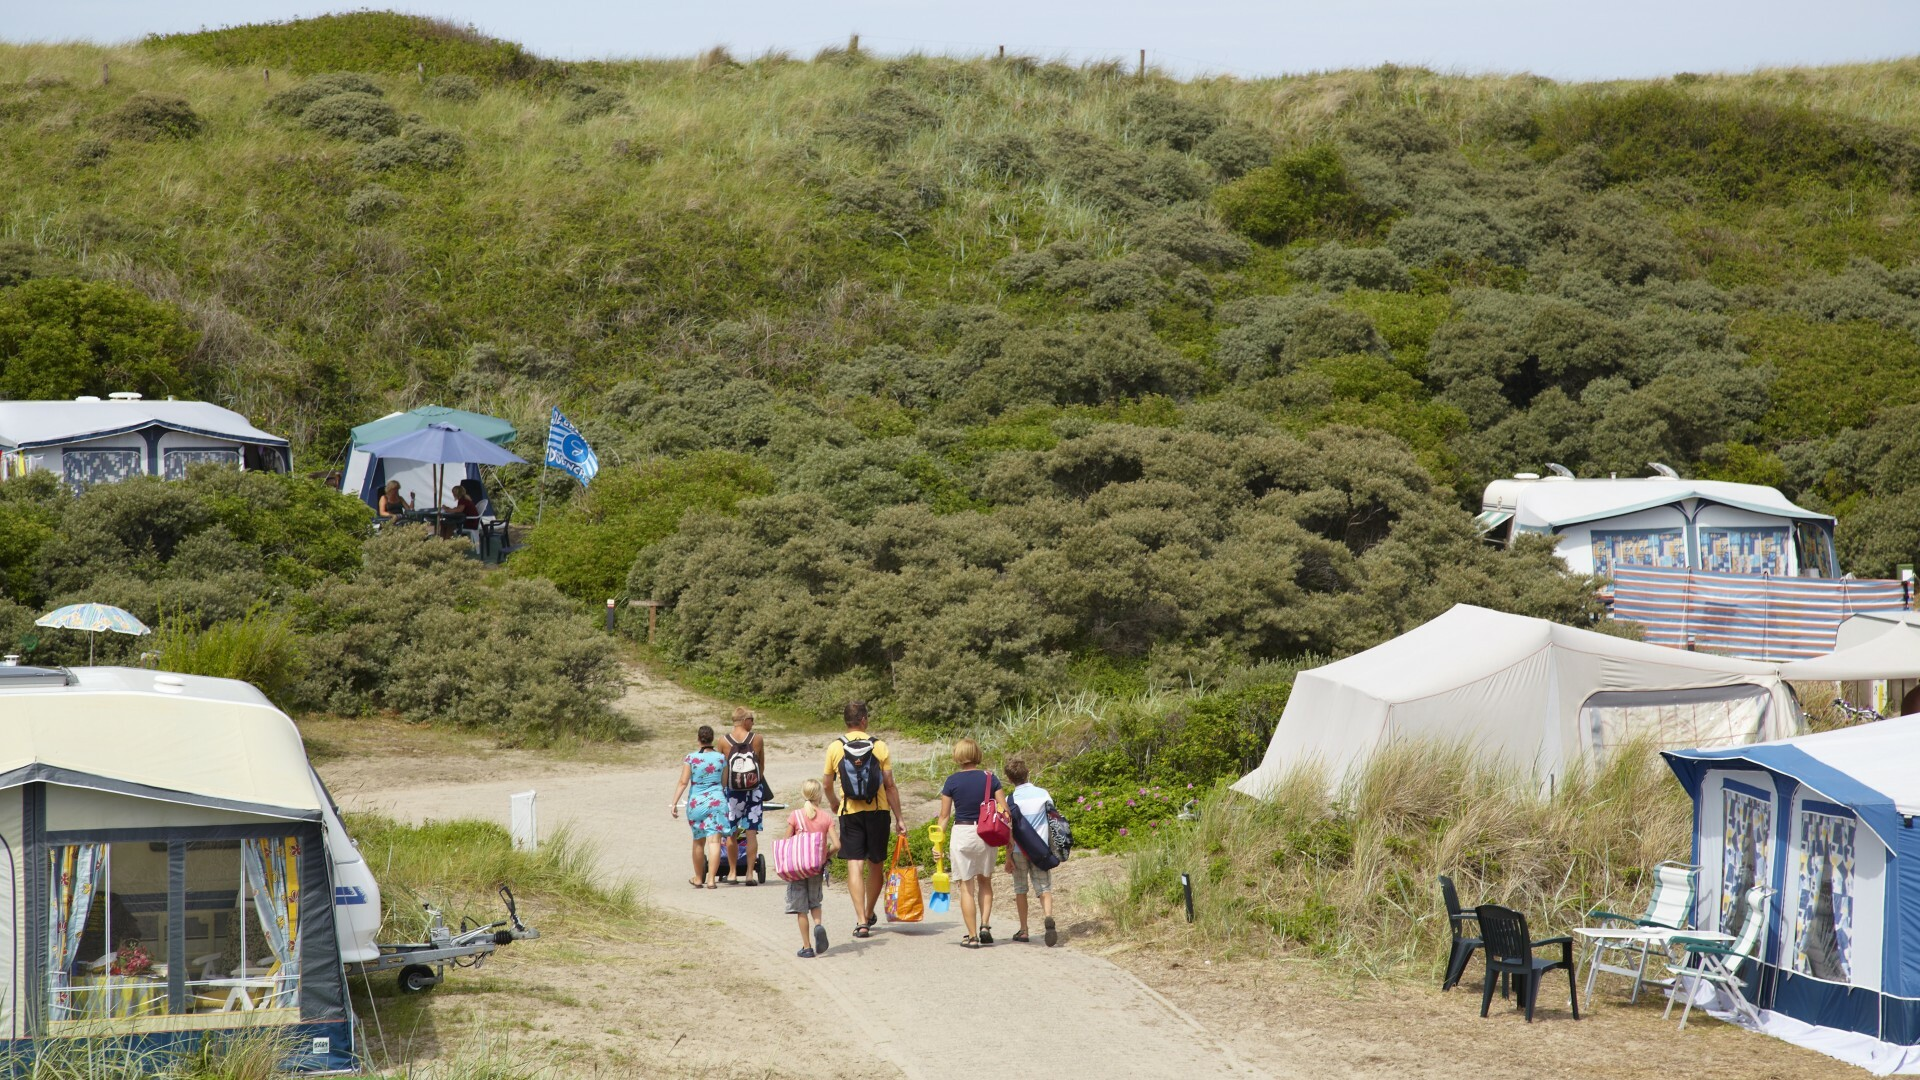 Groep loopt richting strand op Camping Kogerstrand VVV Texel